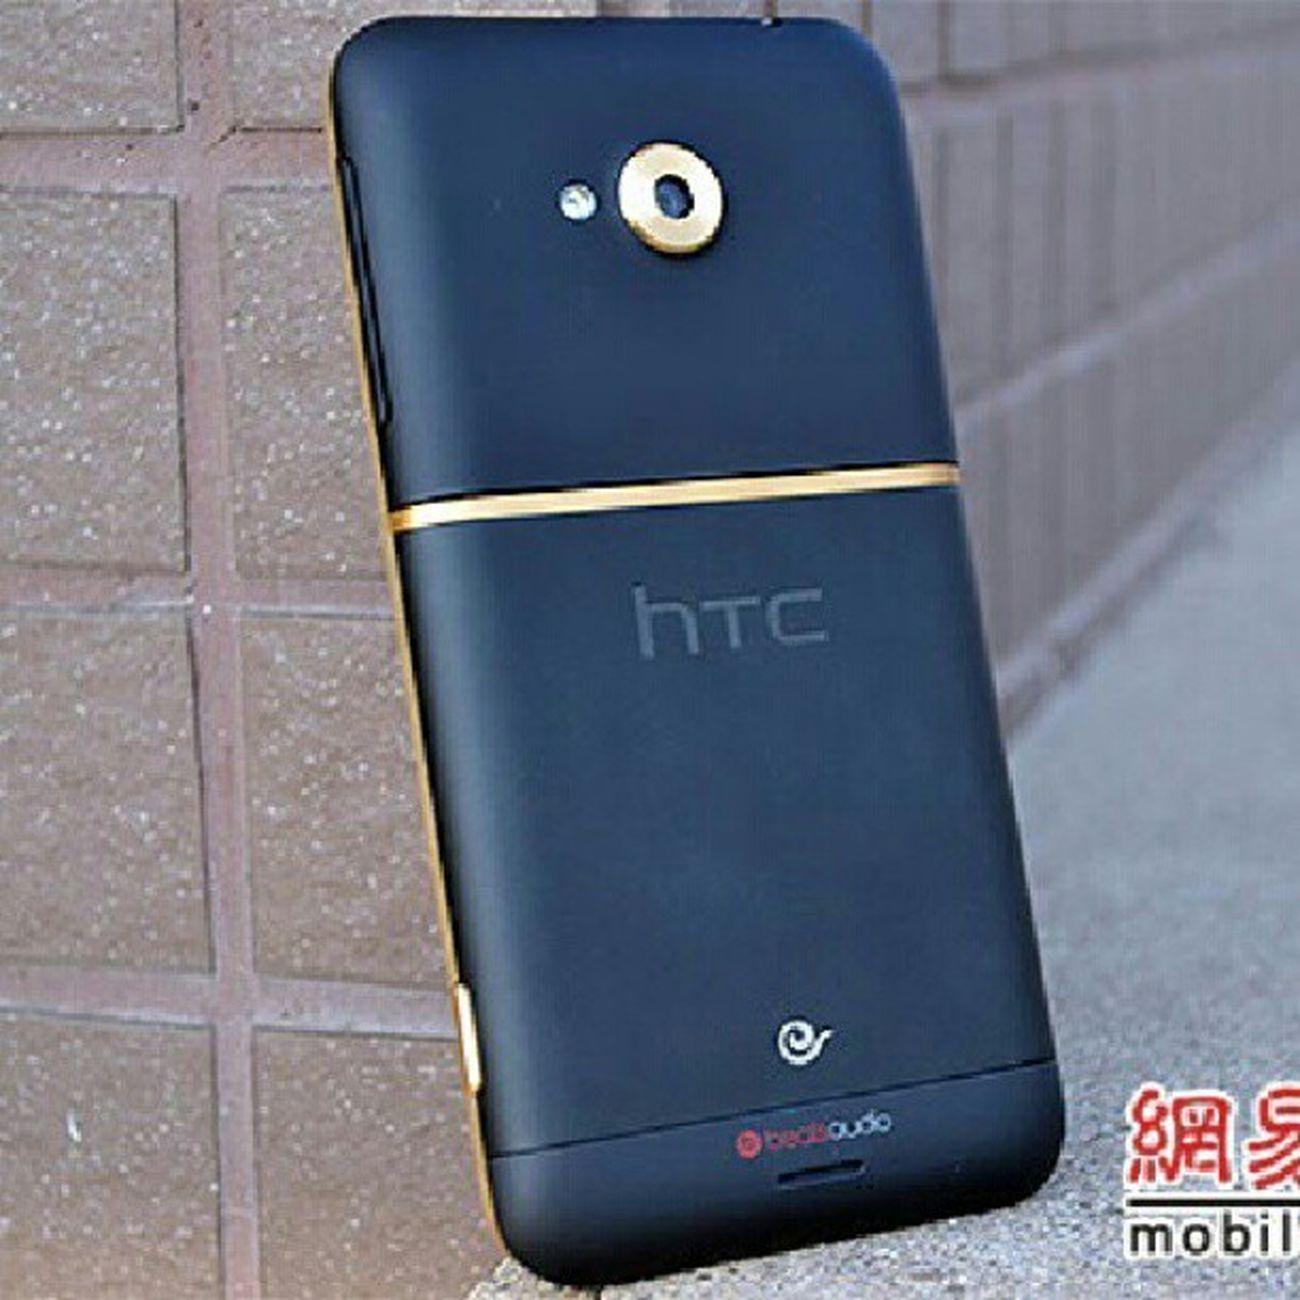 I wish the EVO came in this color HTC Evo HTCEvo HTConeXC HTCone htcEvo4glte